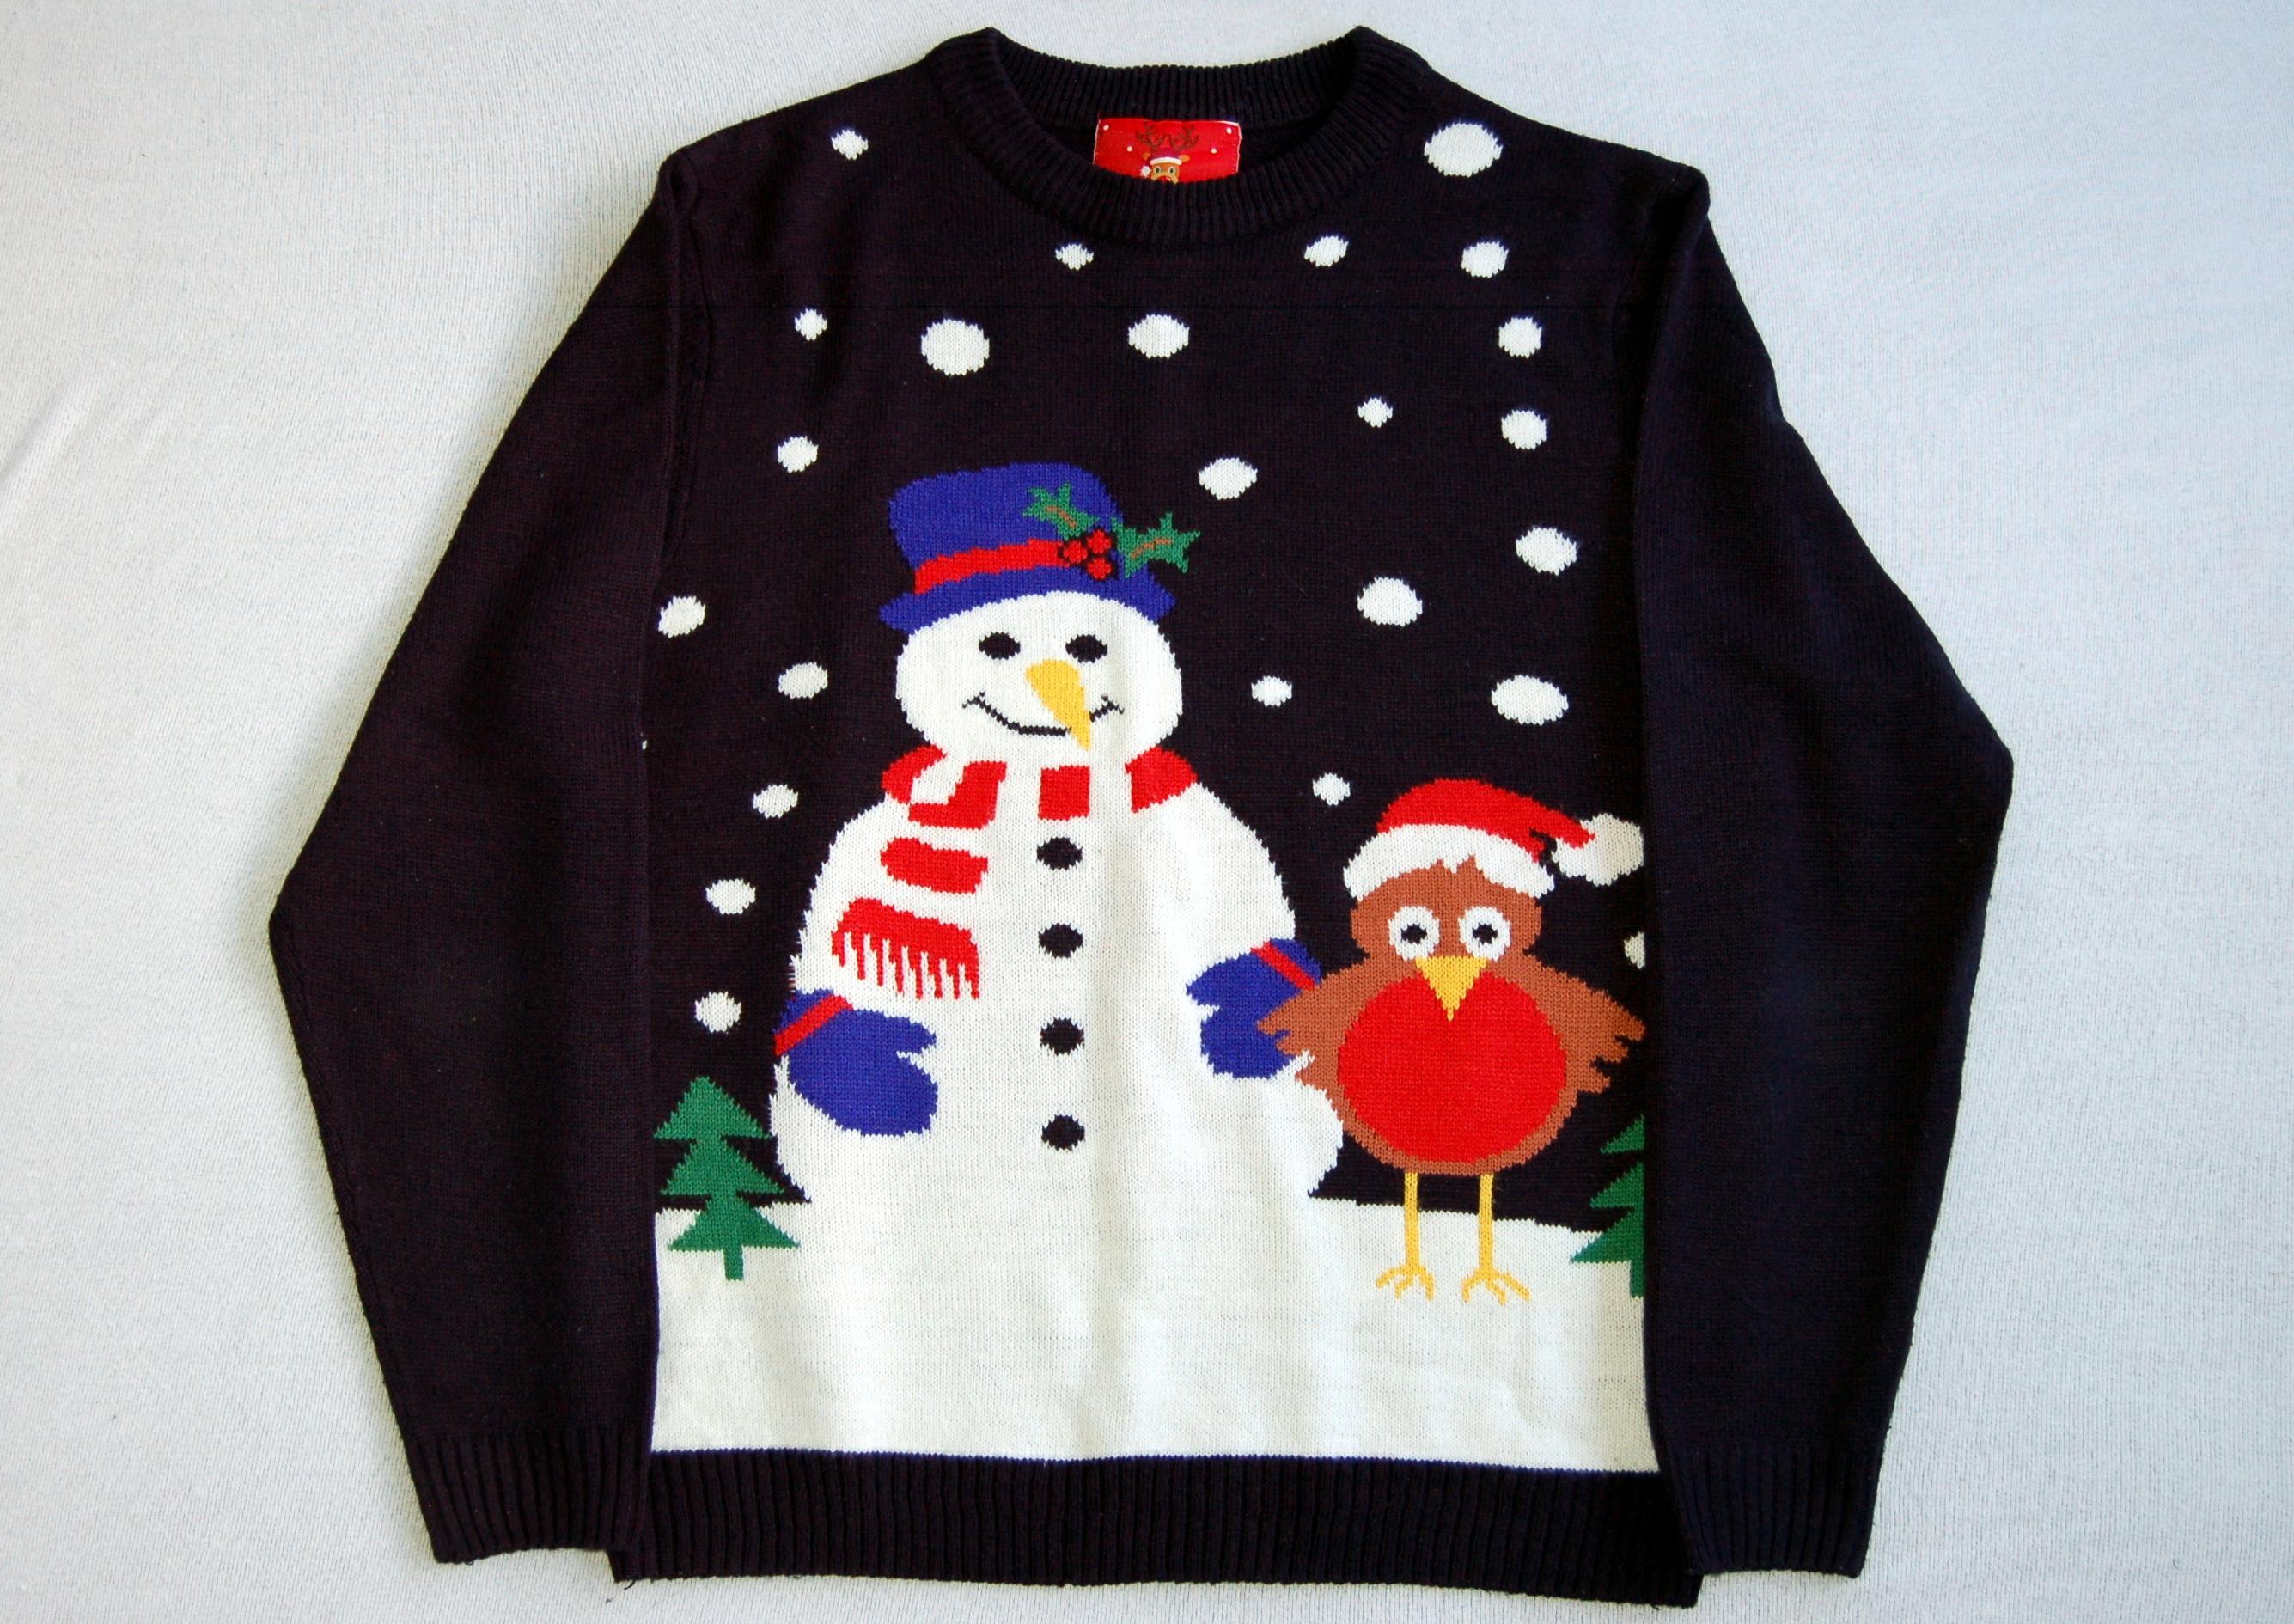 Aalborg-shop hitter: Danskerne er vilde med julesweater